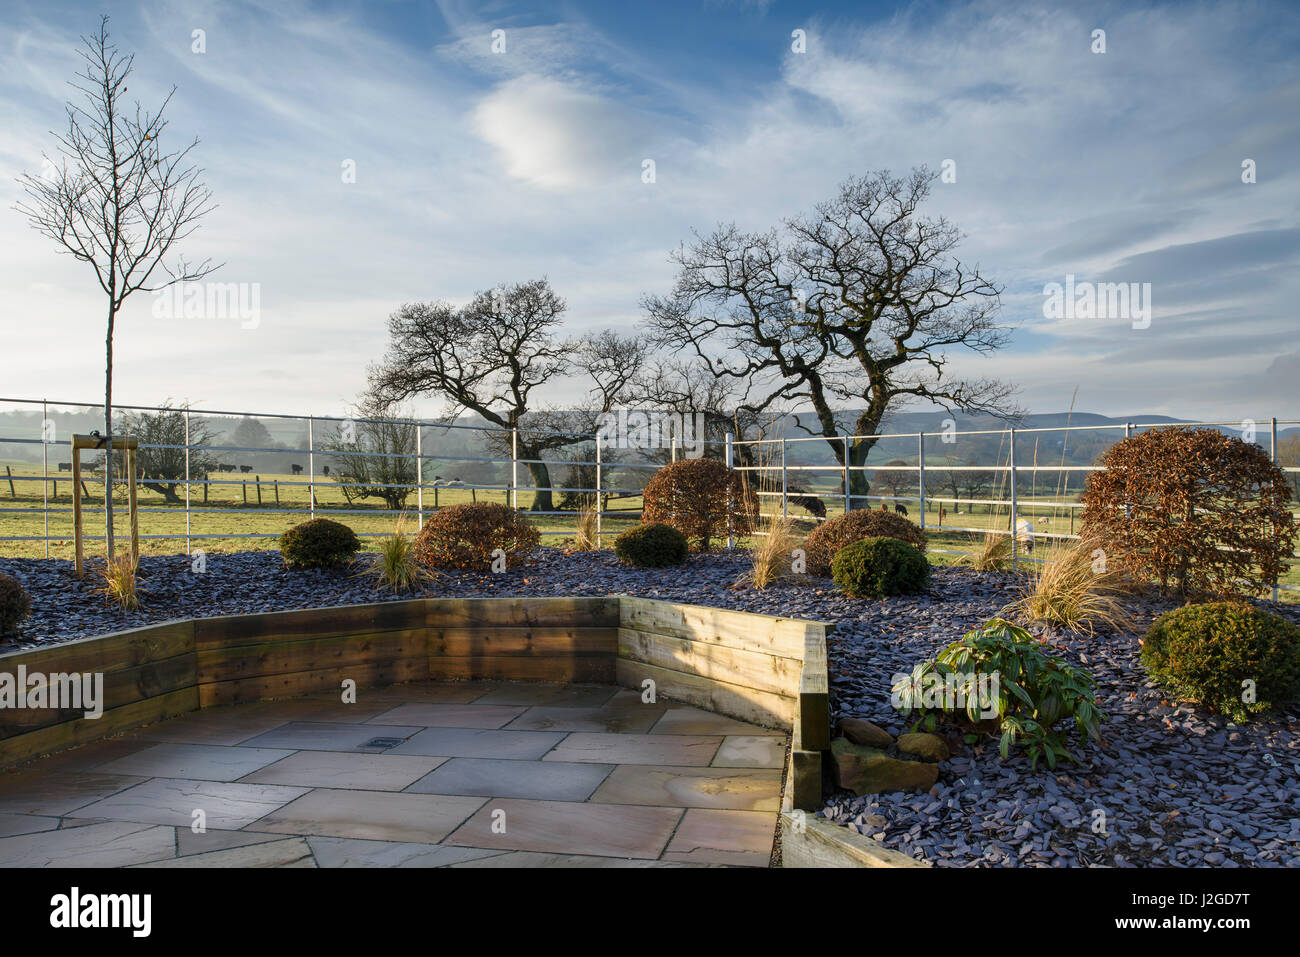 Winter sun on beautiful, private garden, Yorkshire, England, UK - stylish, contemporary design, hard landscaping - Stock Image